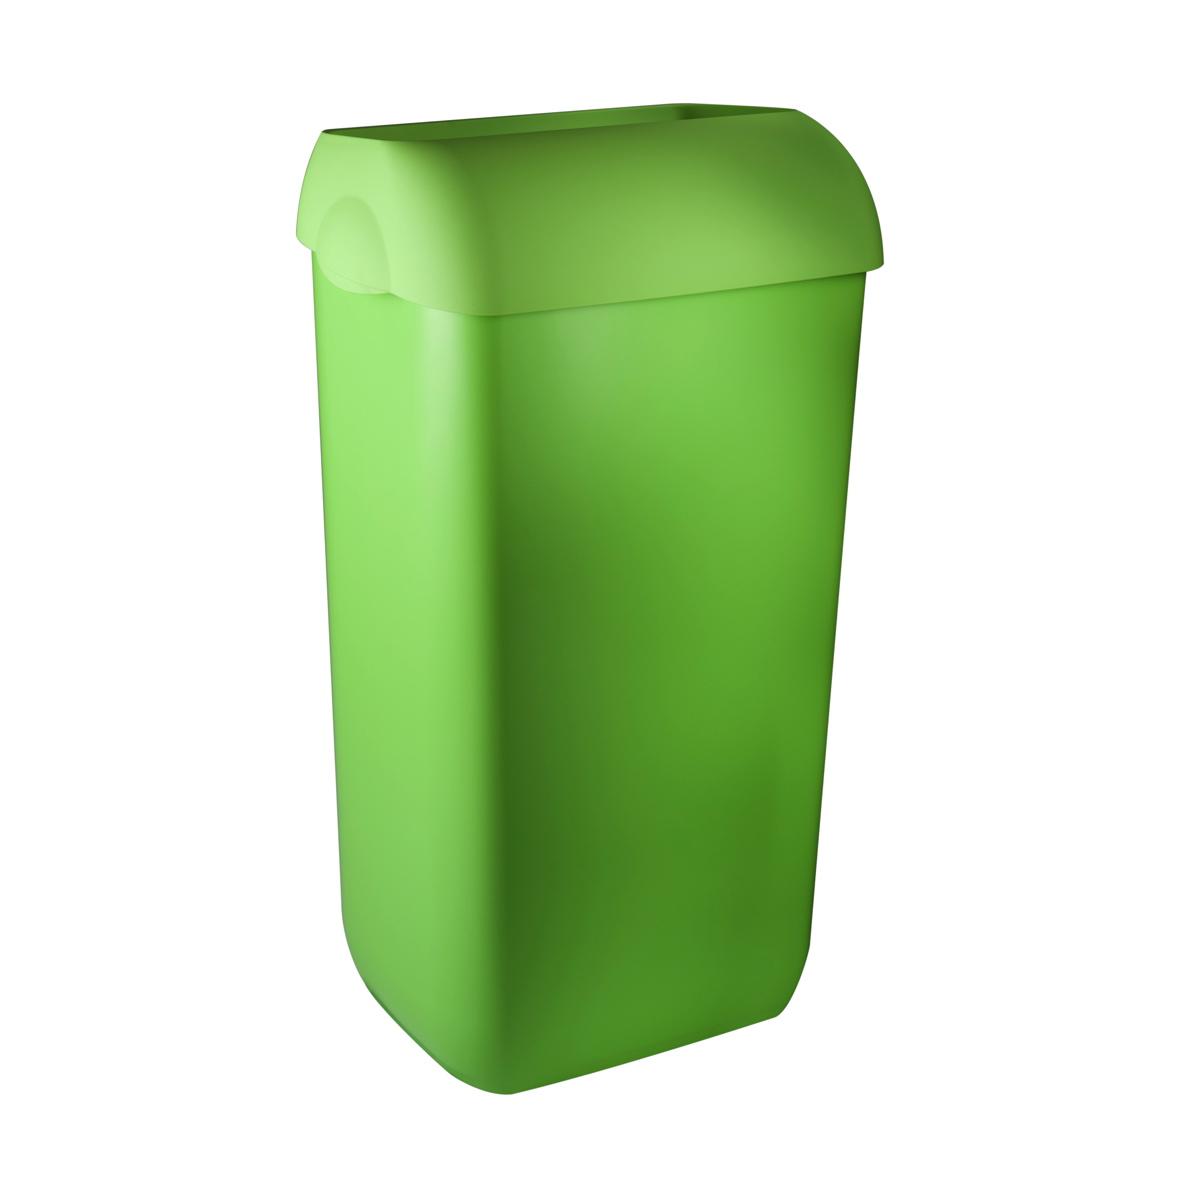 KOŠ za odpadke 23 l Colored